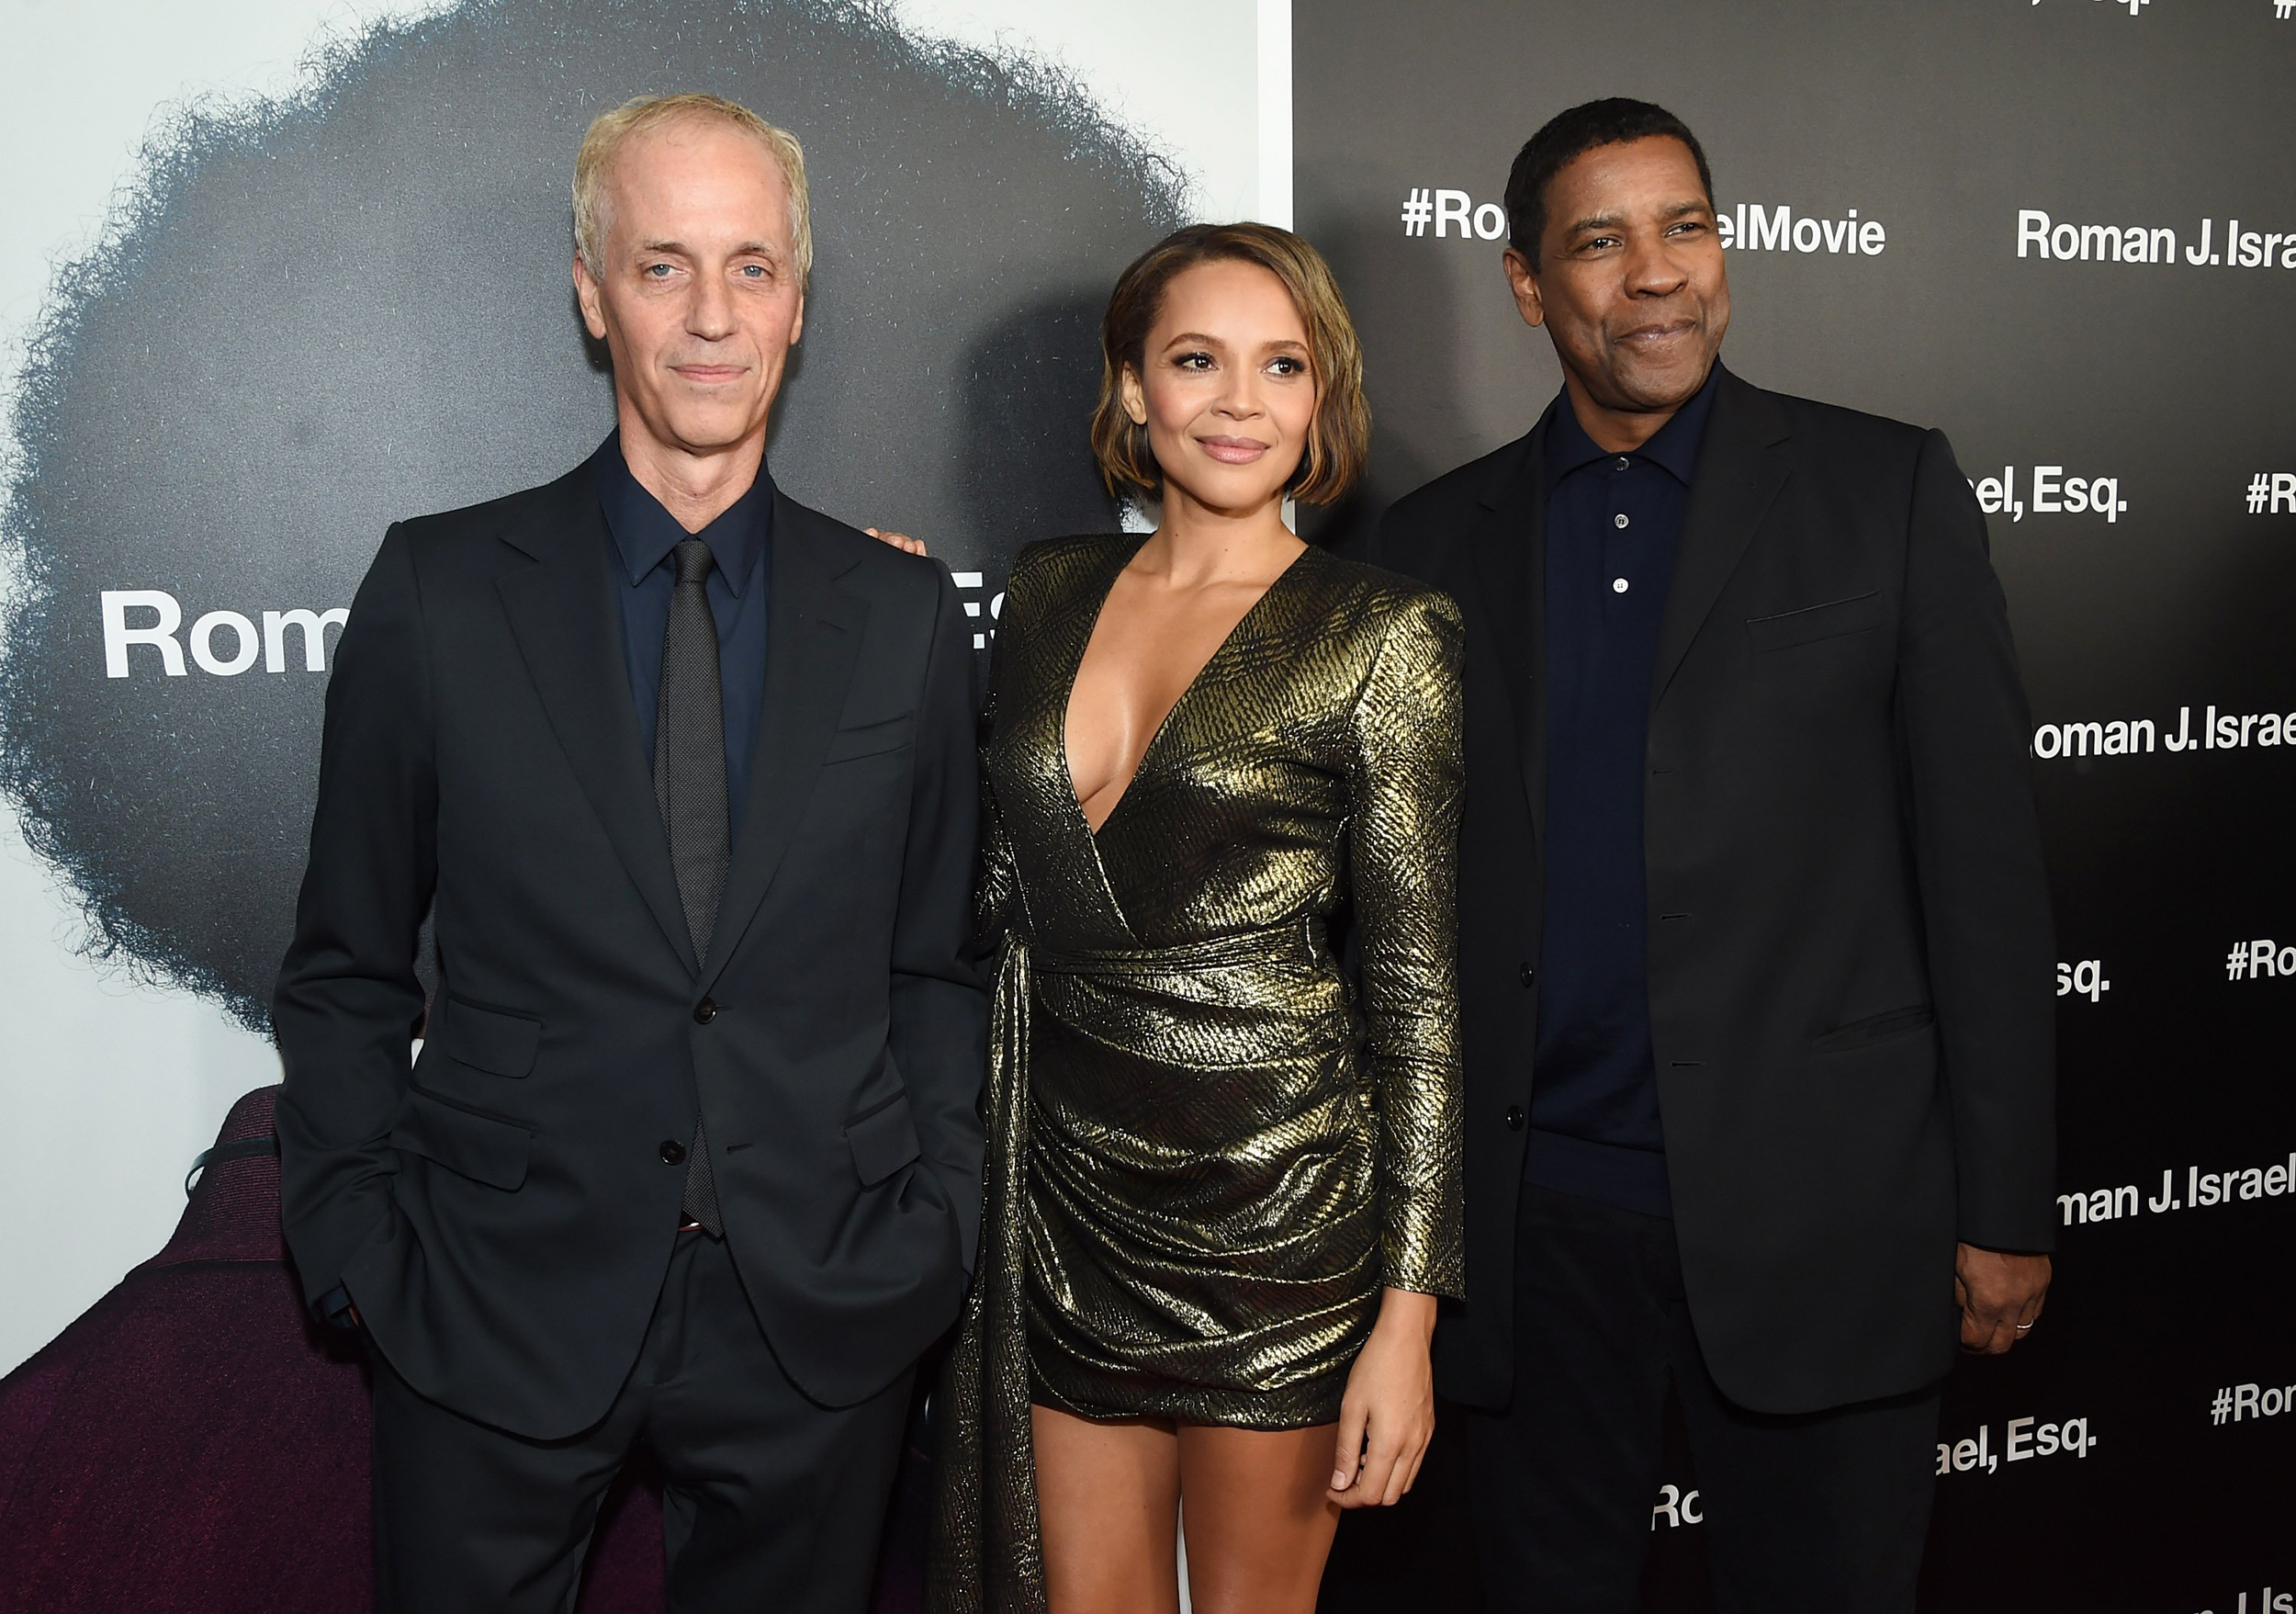 Image: Dan Gilroy, Carmen Ejogo and Denzel Washington attend the screening of